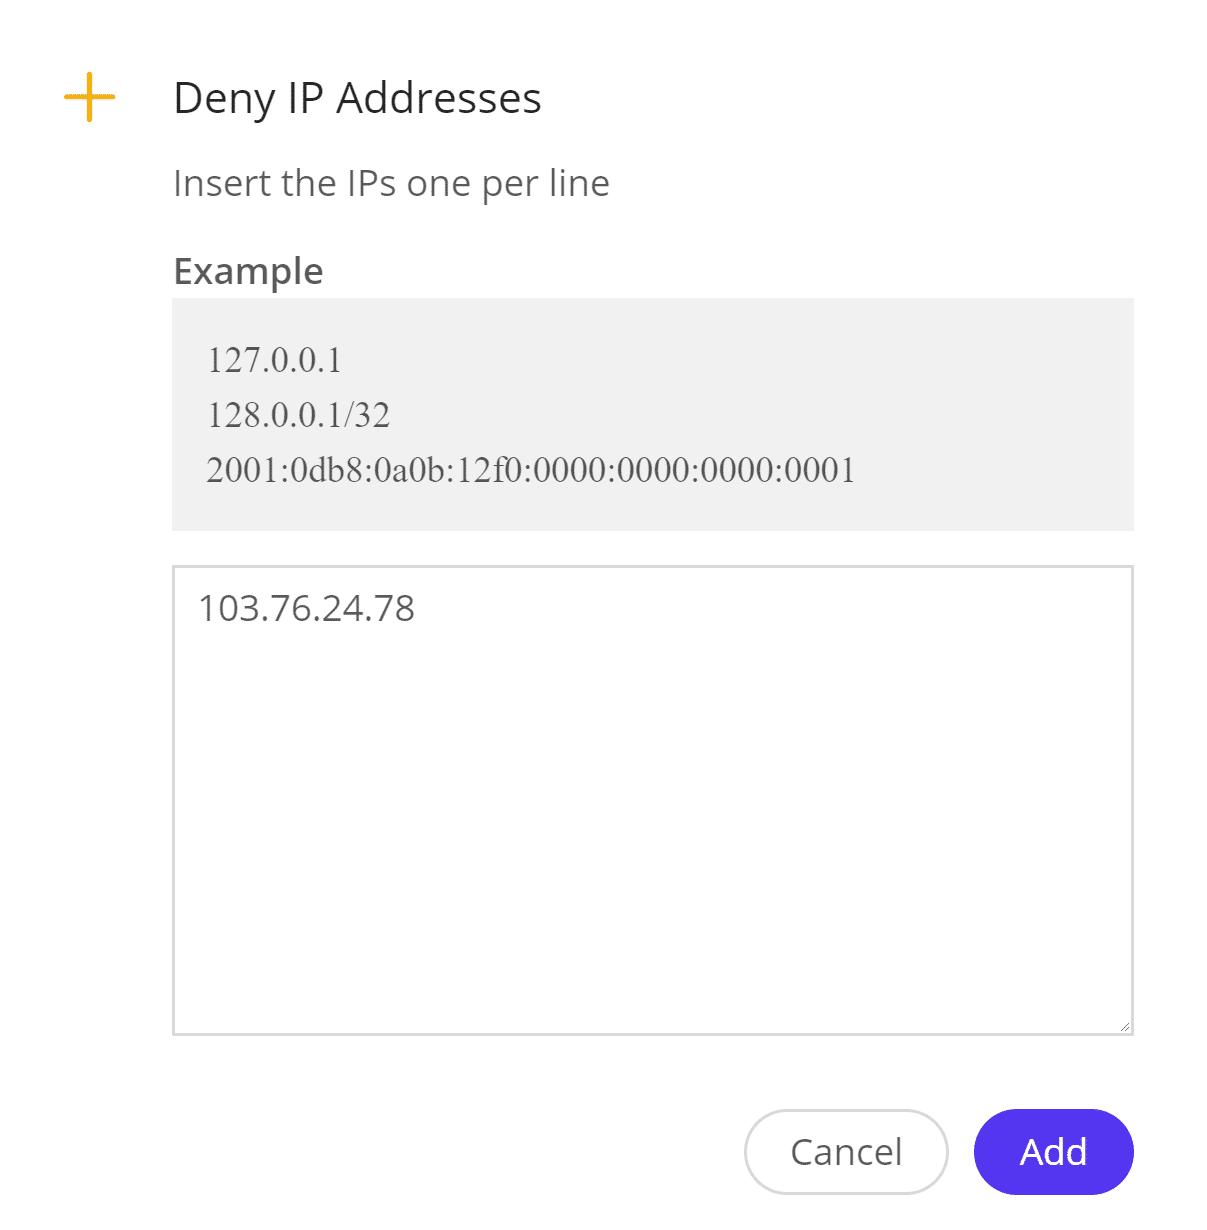 Negar endereços de IP